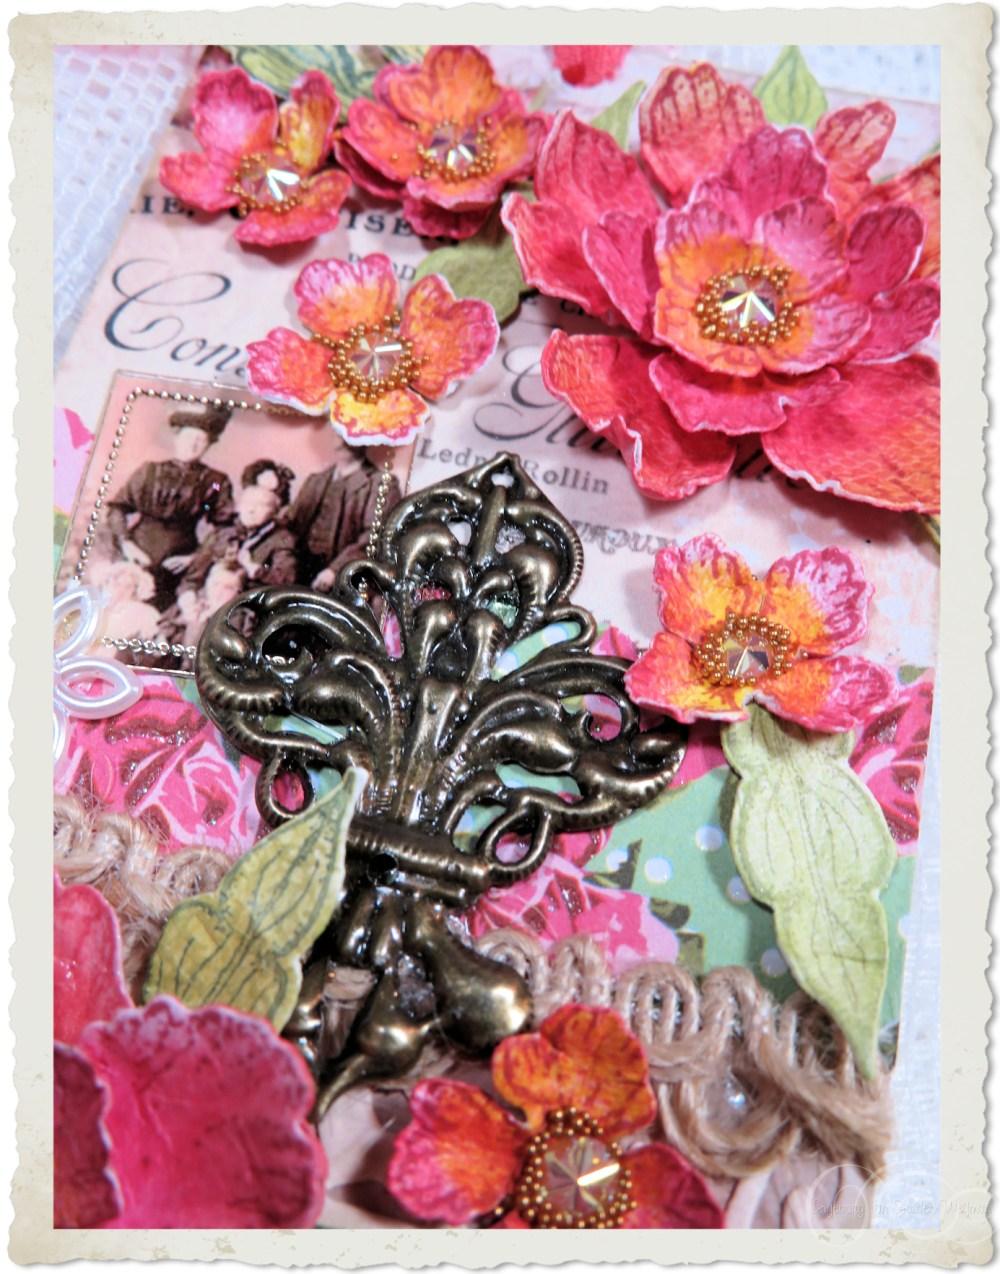 Details of heartfelt creations peony flowers on handmade paper tag